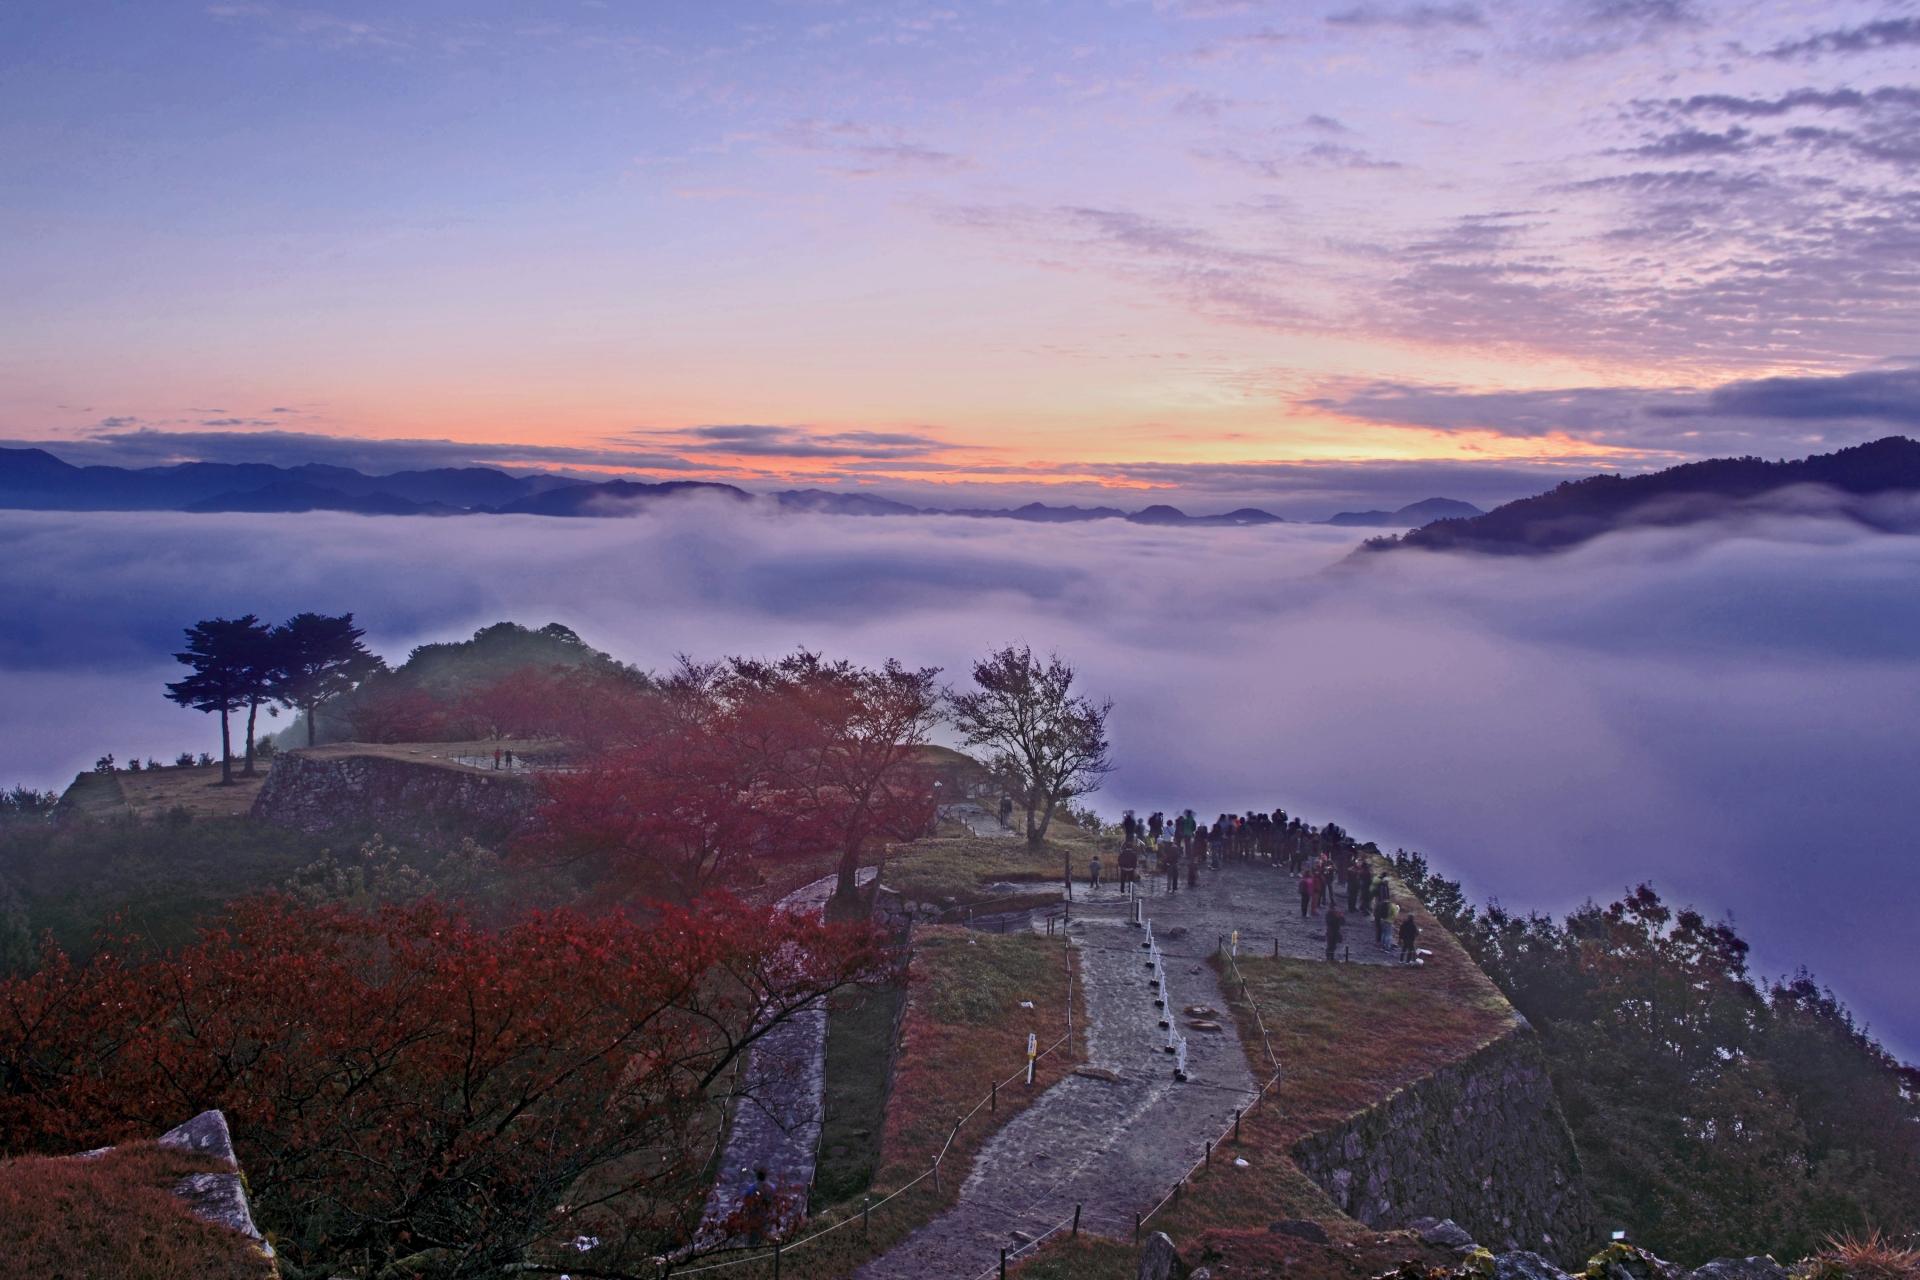 3921891_m 兵庫県 竹田城(雲海に包まれる秋におすすめの絶景写真スポット!アクセス情報や雲海の発生条件など)